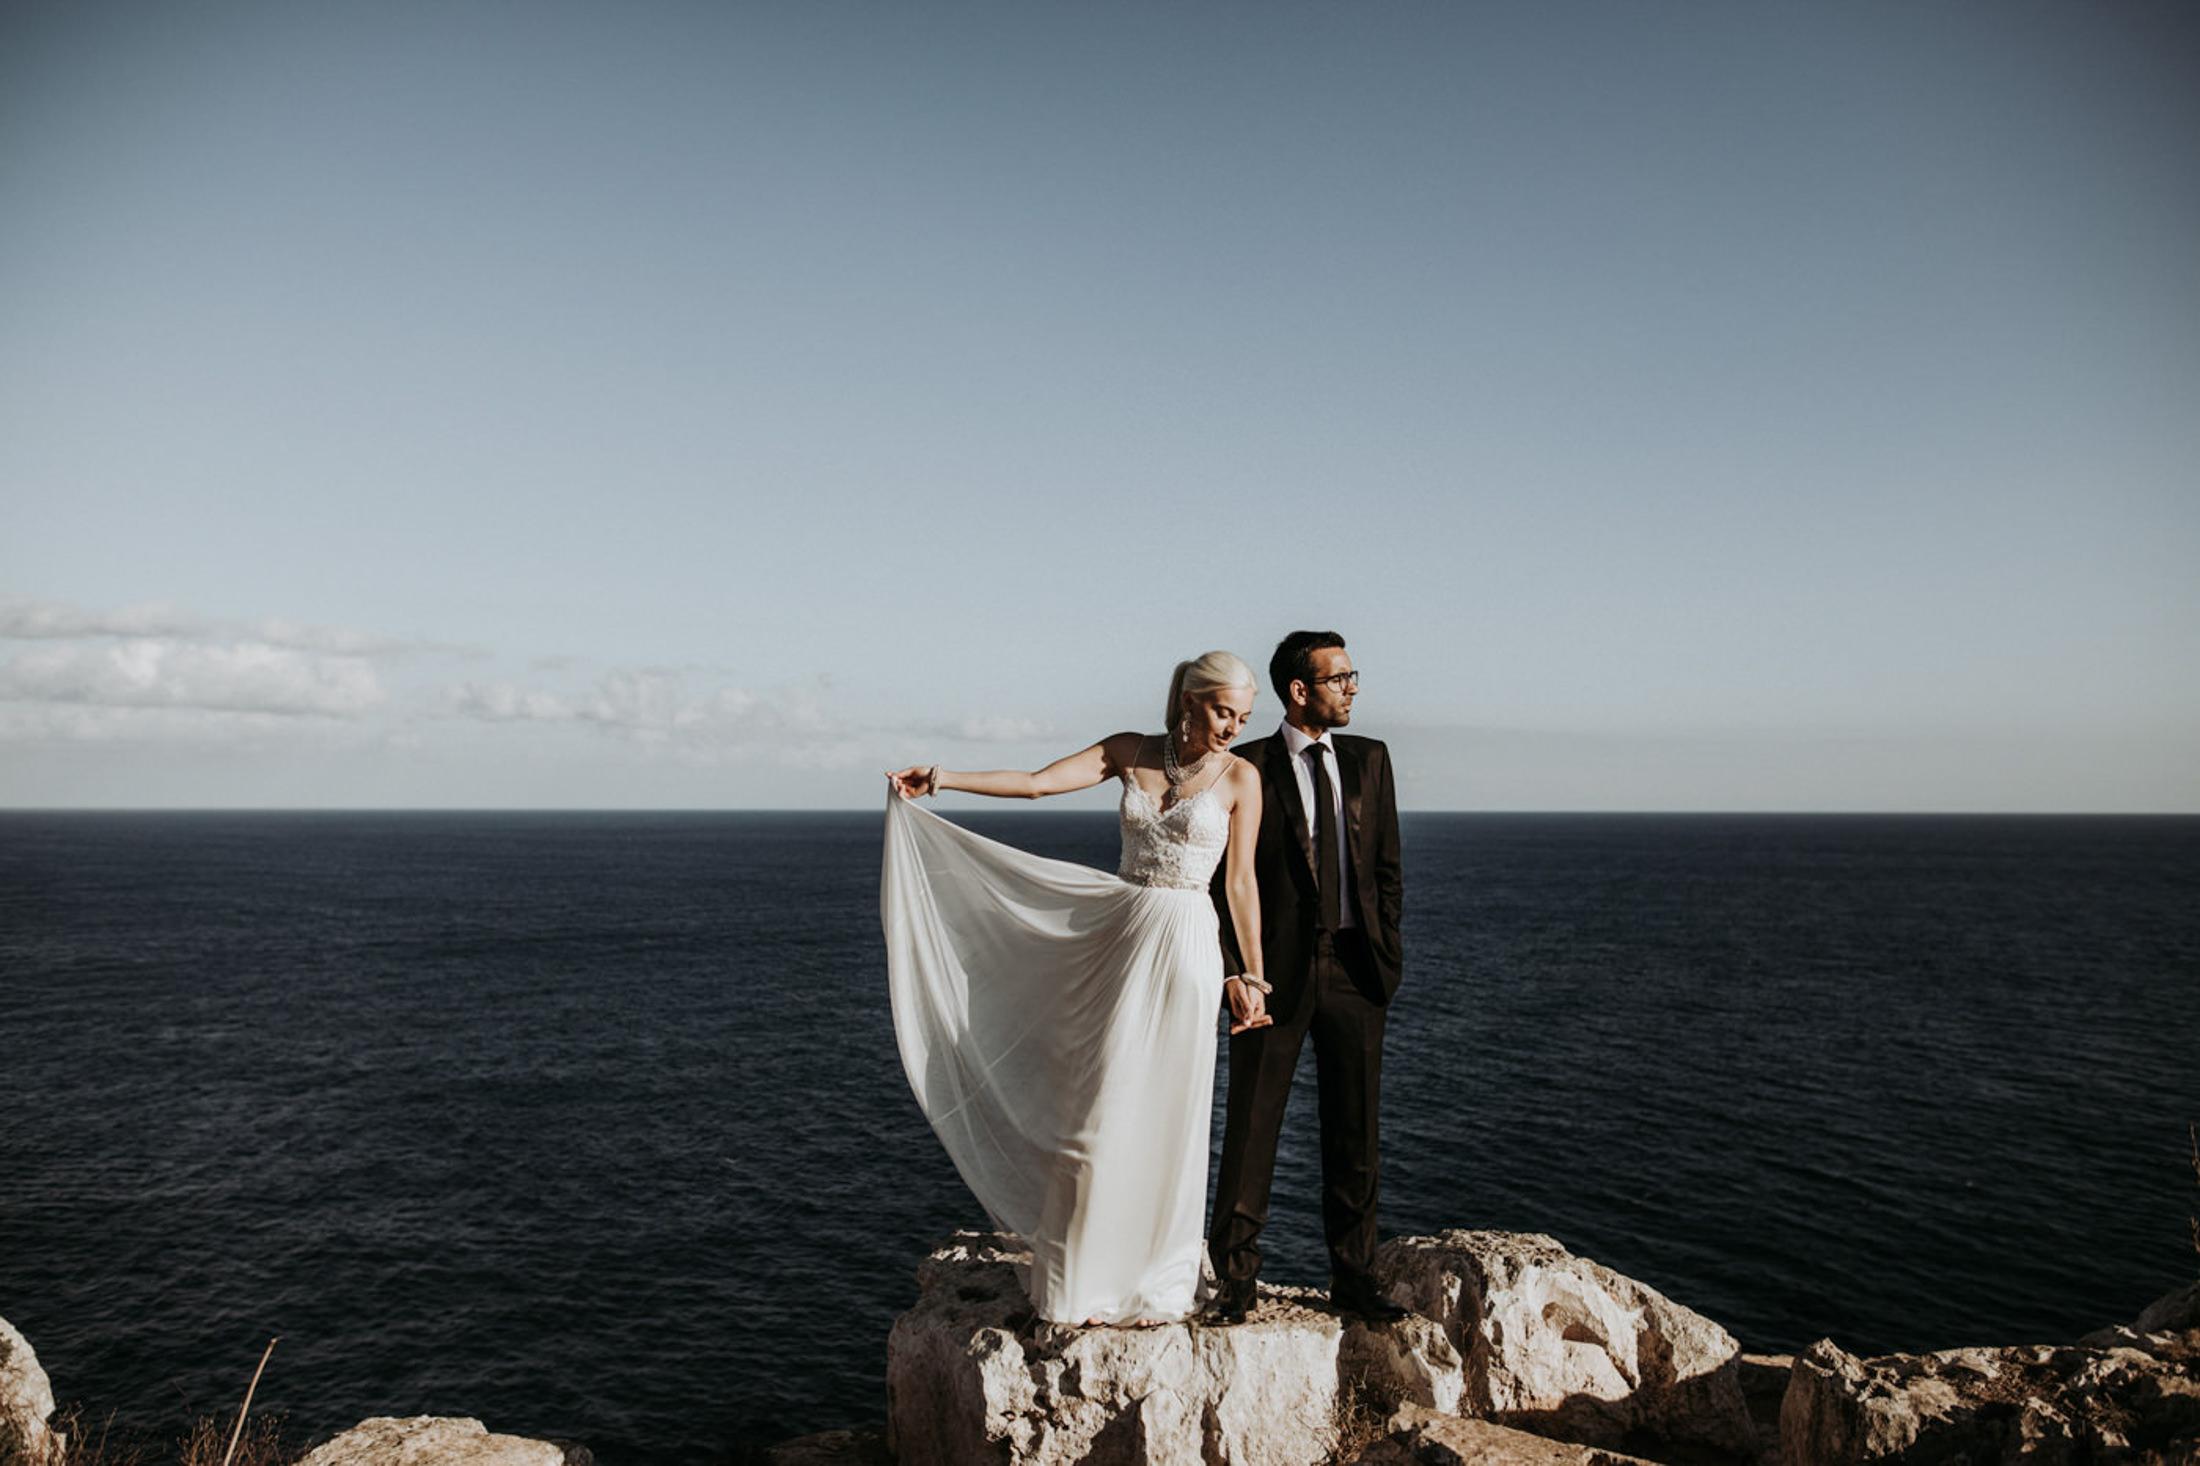 Wedding_Photographer_Mallorca_Daniela-Marquardt_Photography_New_York_Iceland_Tuscany_Santorini_Portugal_Austria_Bavaria_Elopement_Hochzeitsfotograf_AntjeRajat2_93